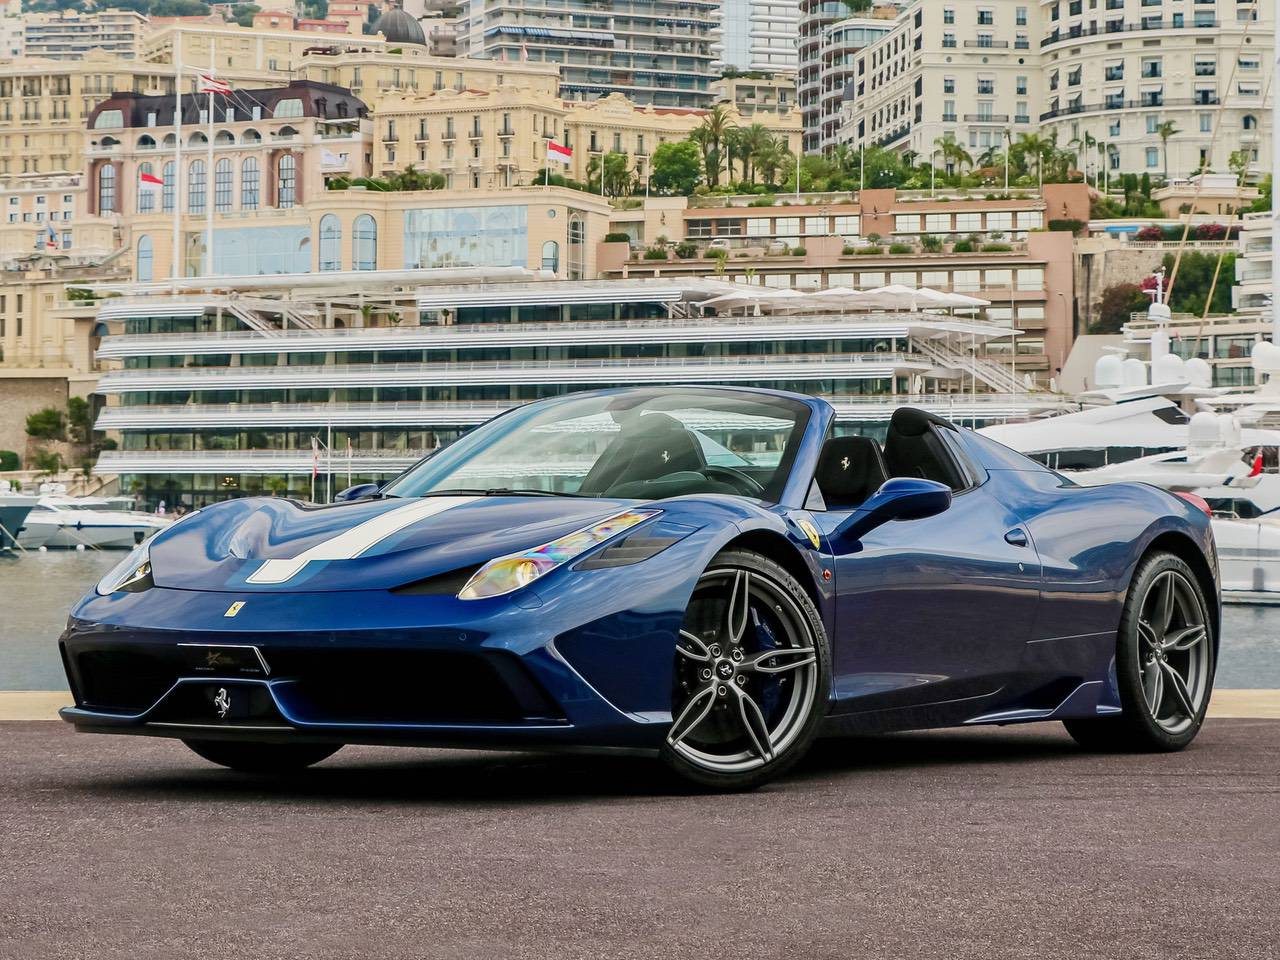 Ferrari-458-Speciale-Spider-A-0